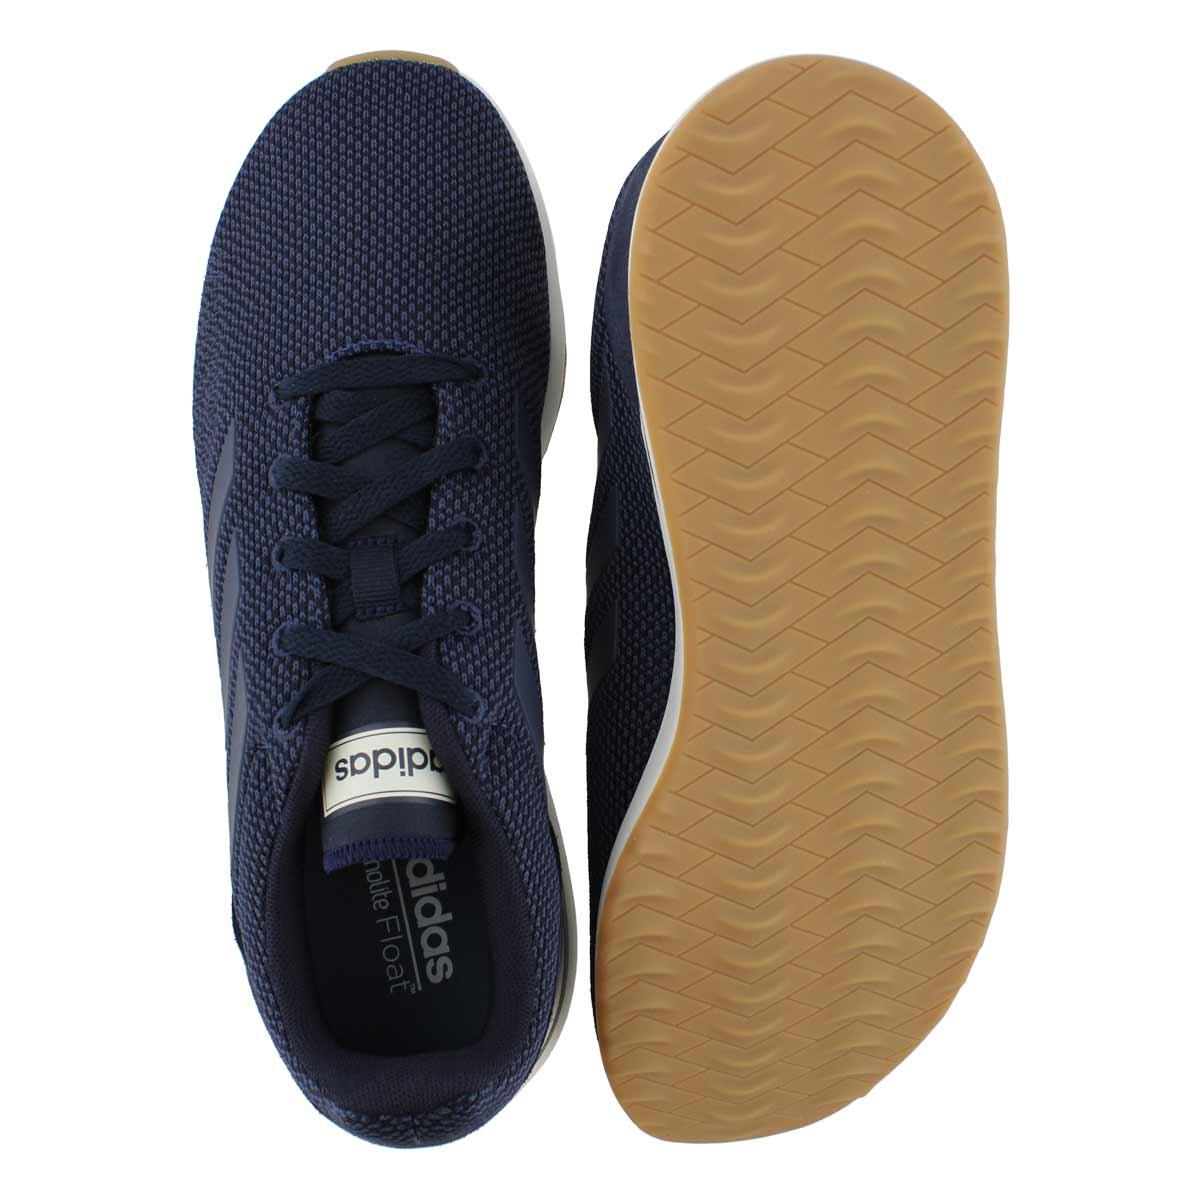 adidas jeans jeans jeans super Vertcentenary banque de l'ouganda 16fa06